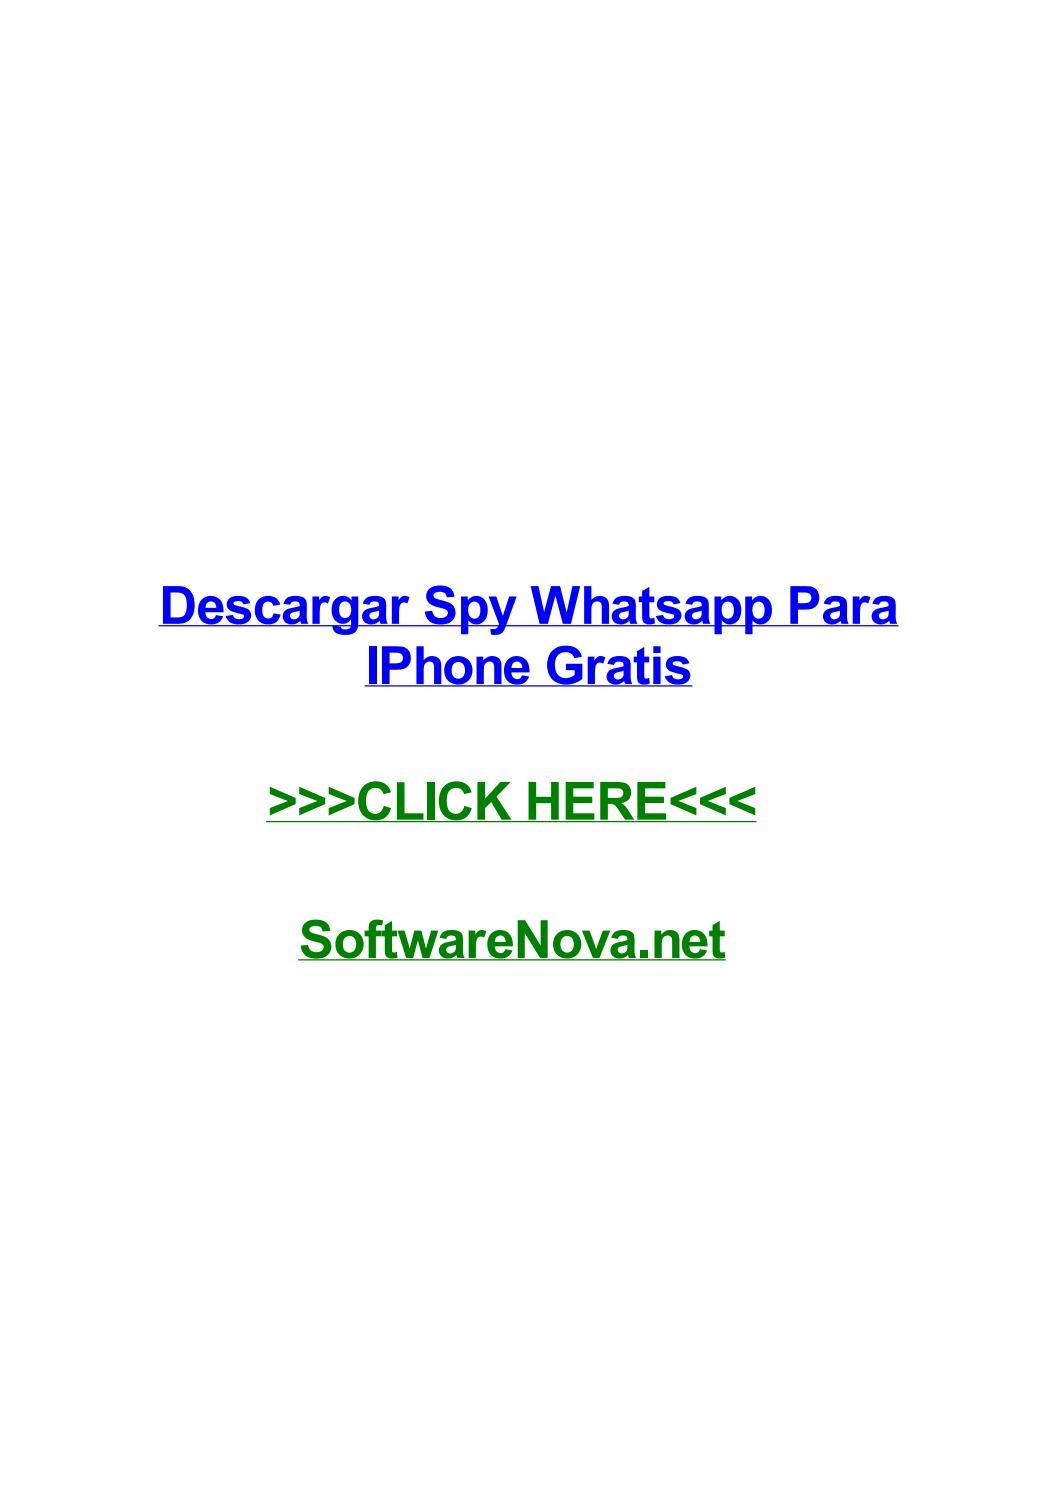 Descargar Spy Whatsapp Para Iphone Gratis By Samantharcmm